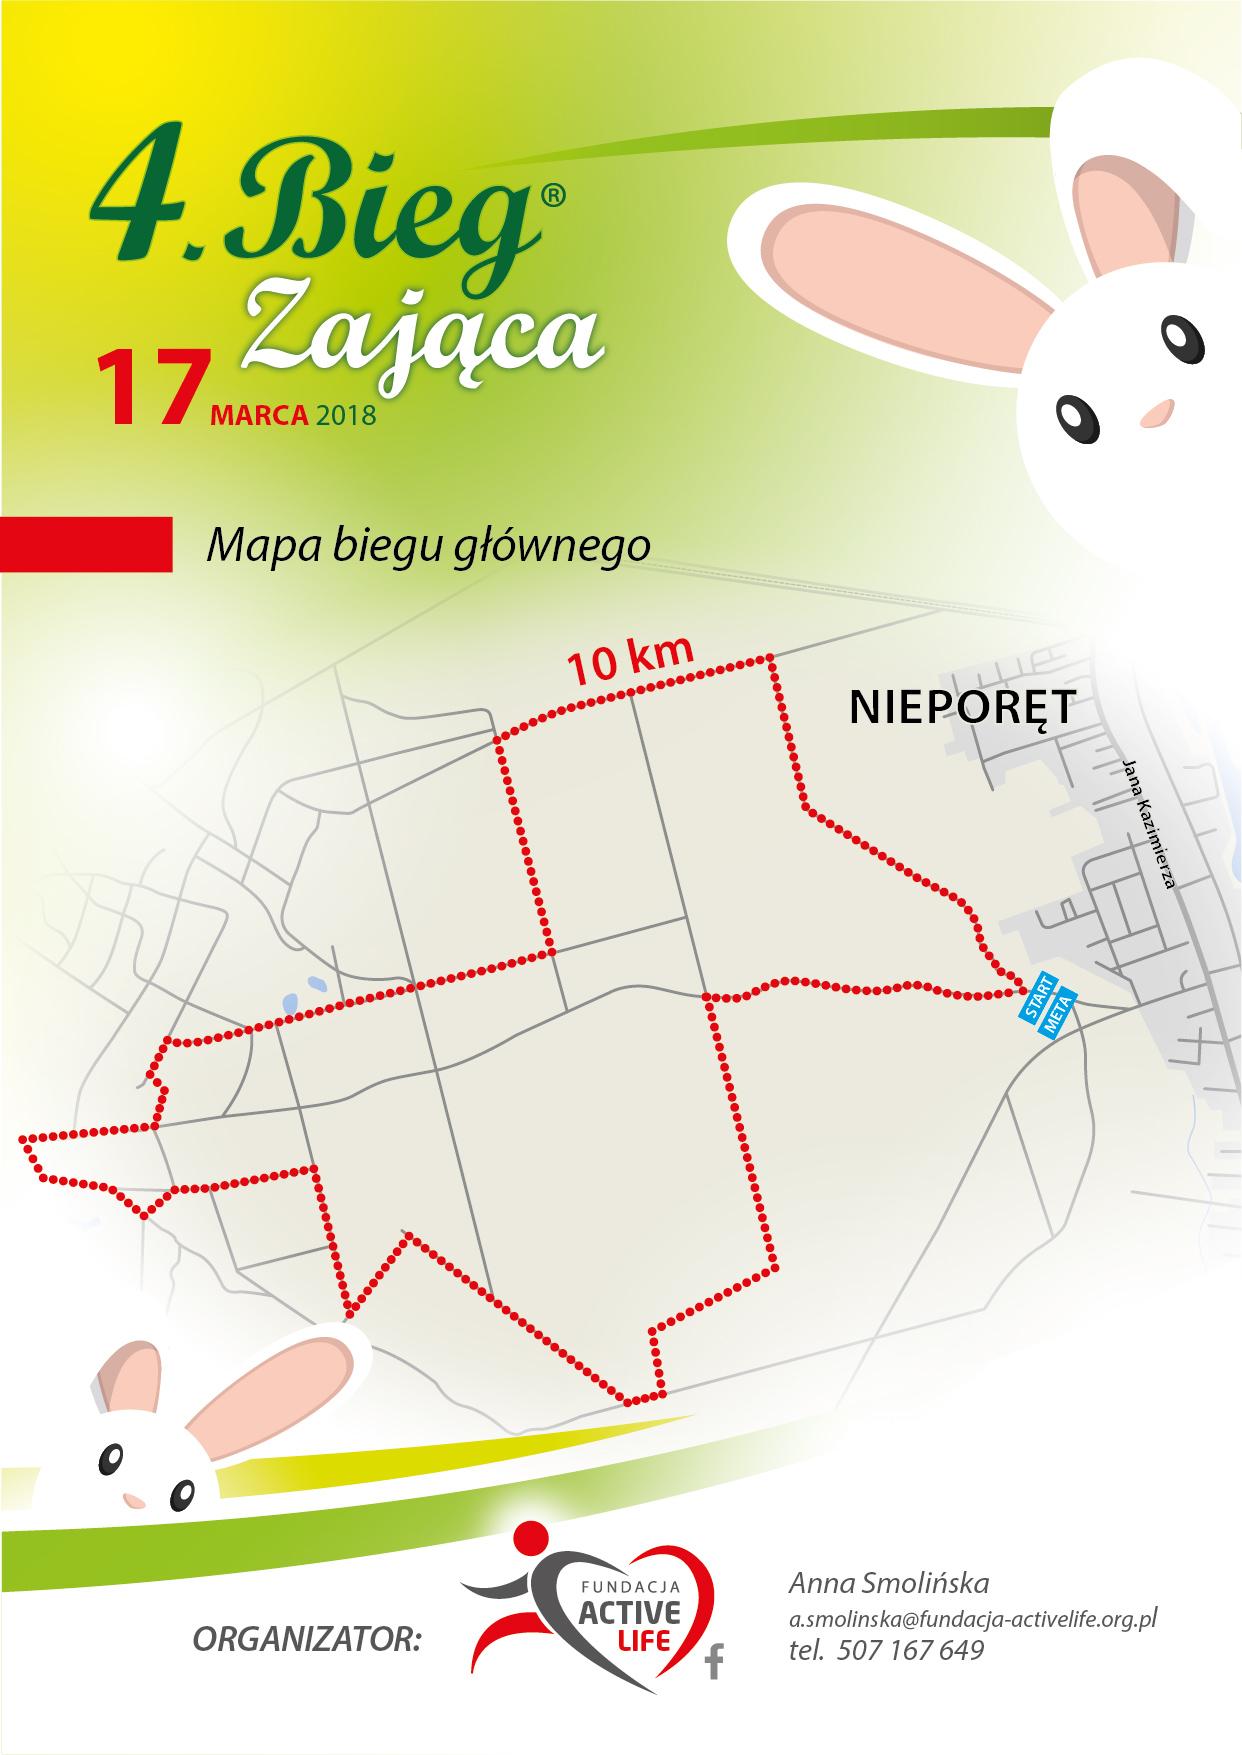 BIEG_ZAJĄCA_4_-_Trasa_biegu_10_km